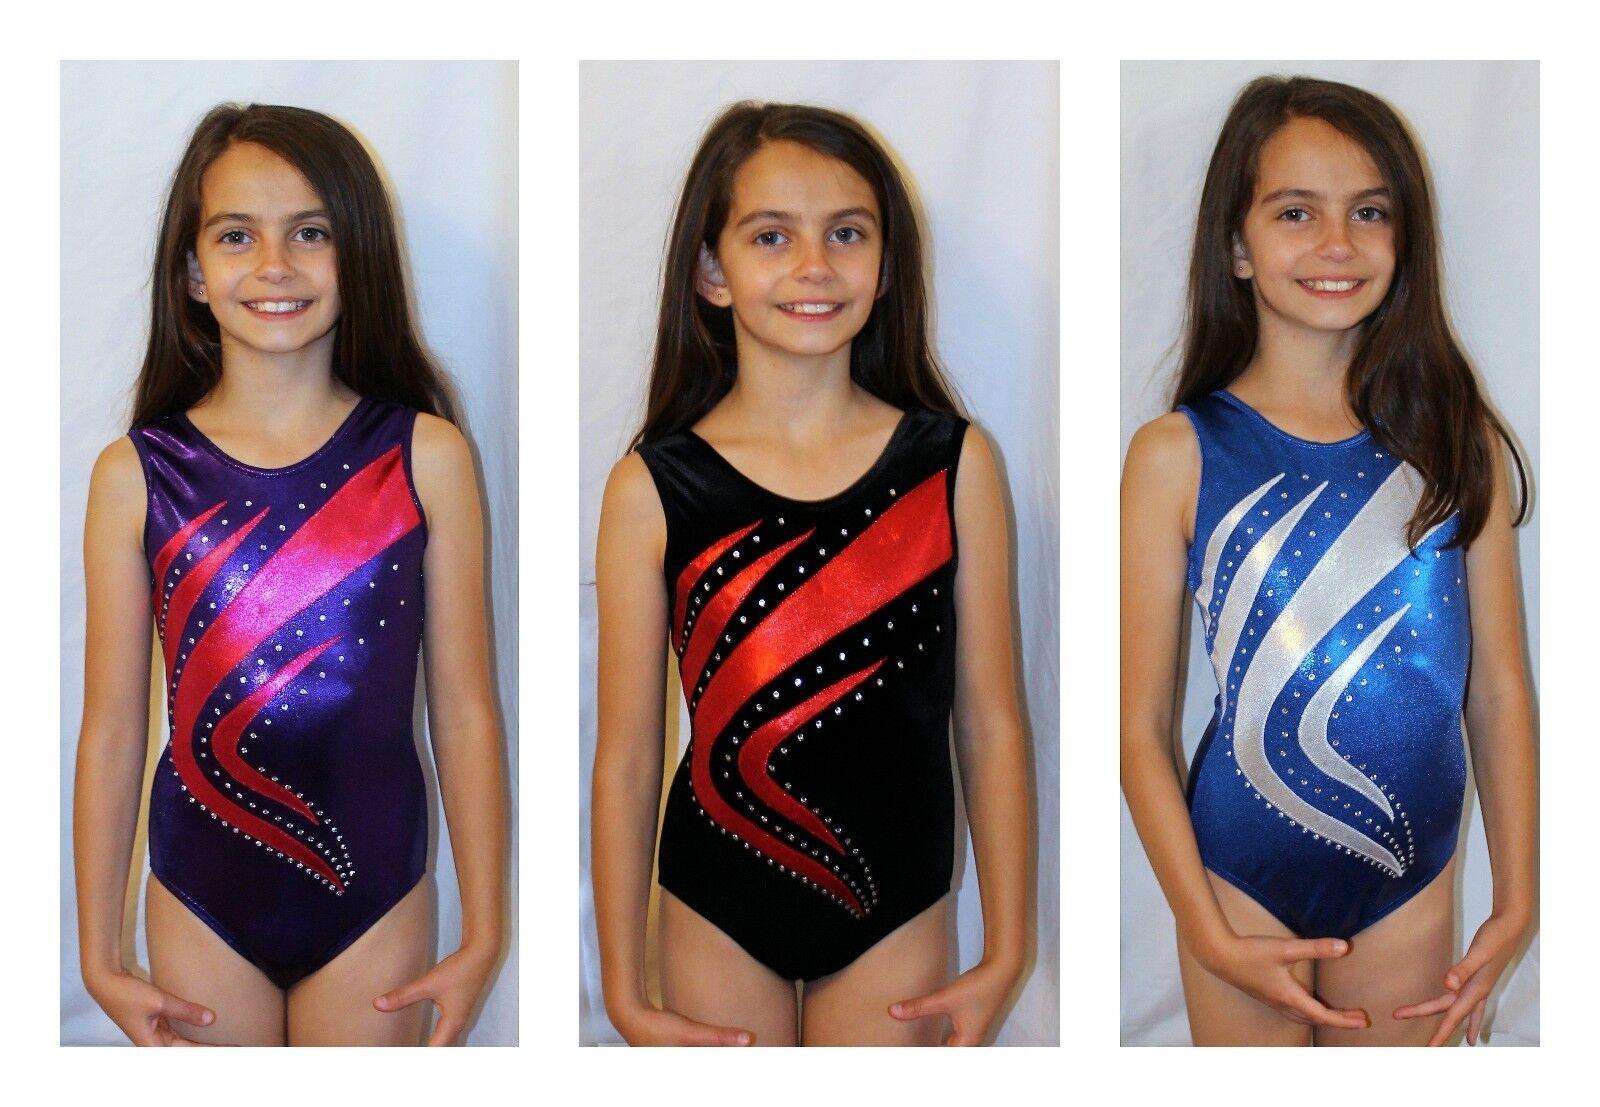 All Sizes Swoosh Girls Gymnastics Leotard with Crystals